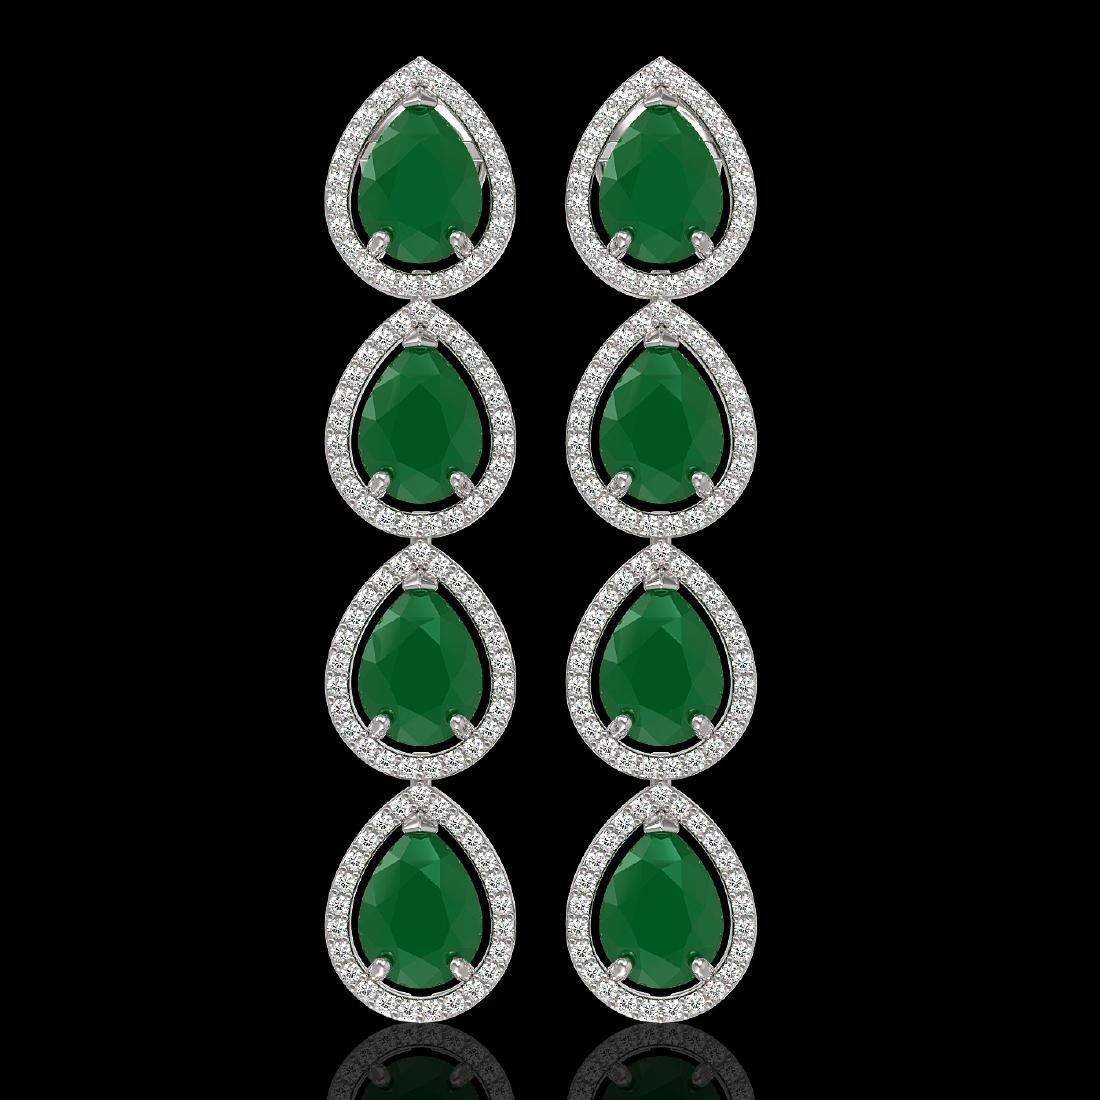 16.01 CTW Emerald & Diamond Halo Earrings 10K White